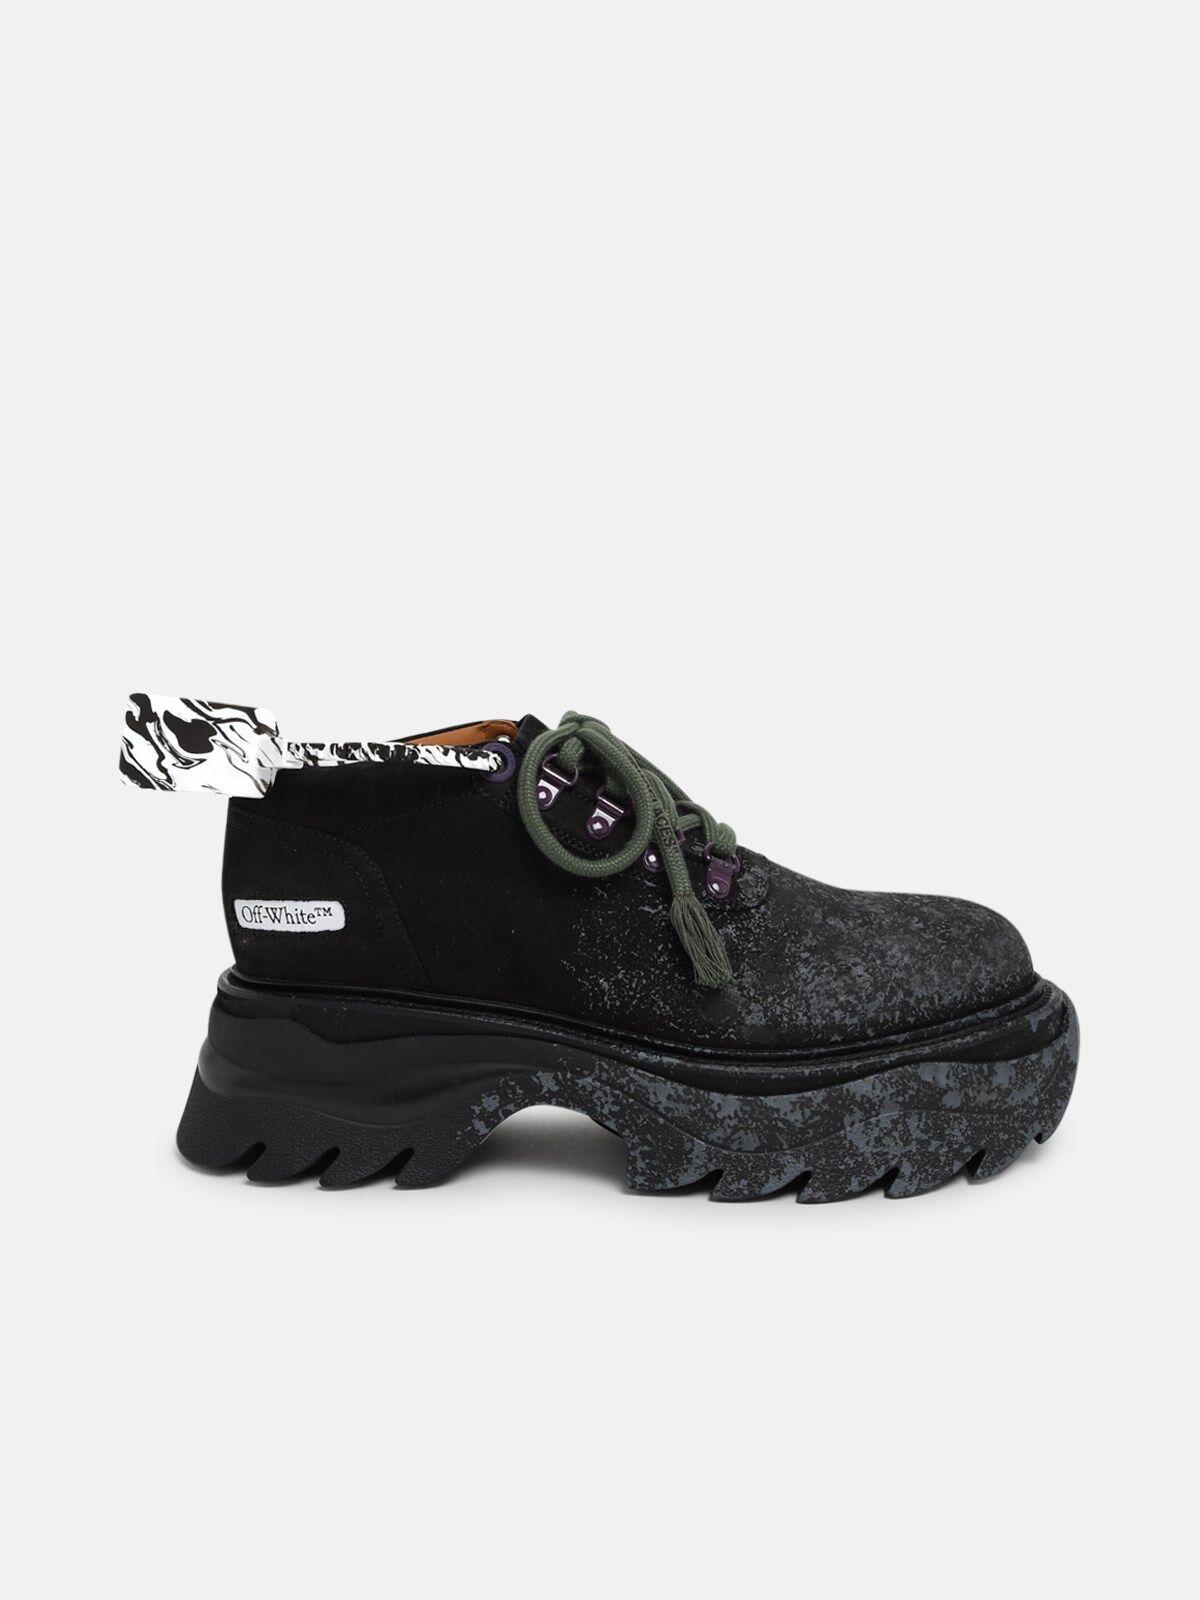 OFF WHITE Black Chunky Shoes (size: EU 41)